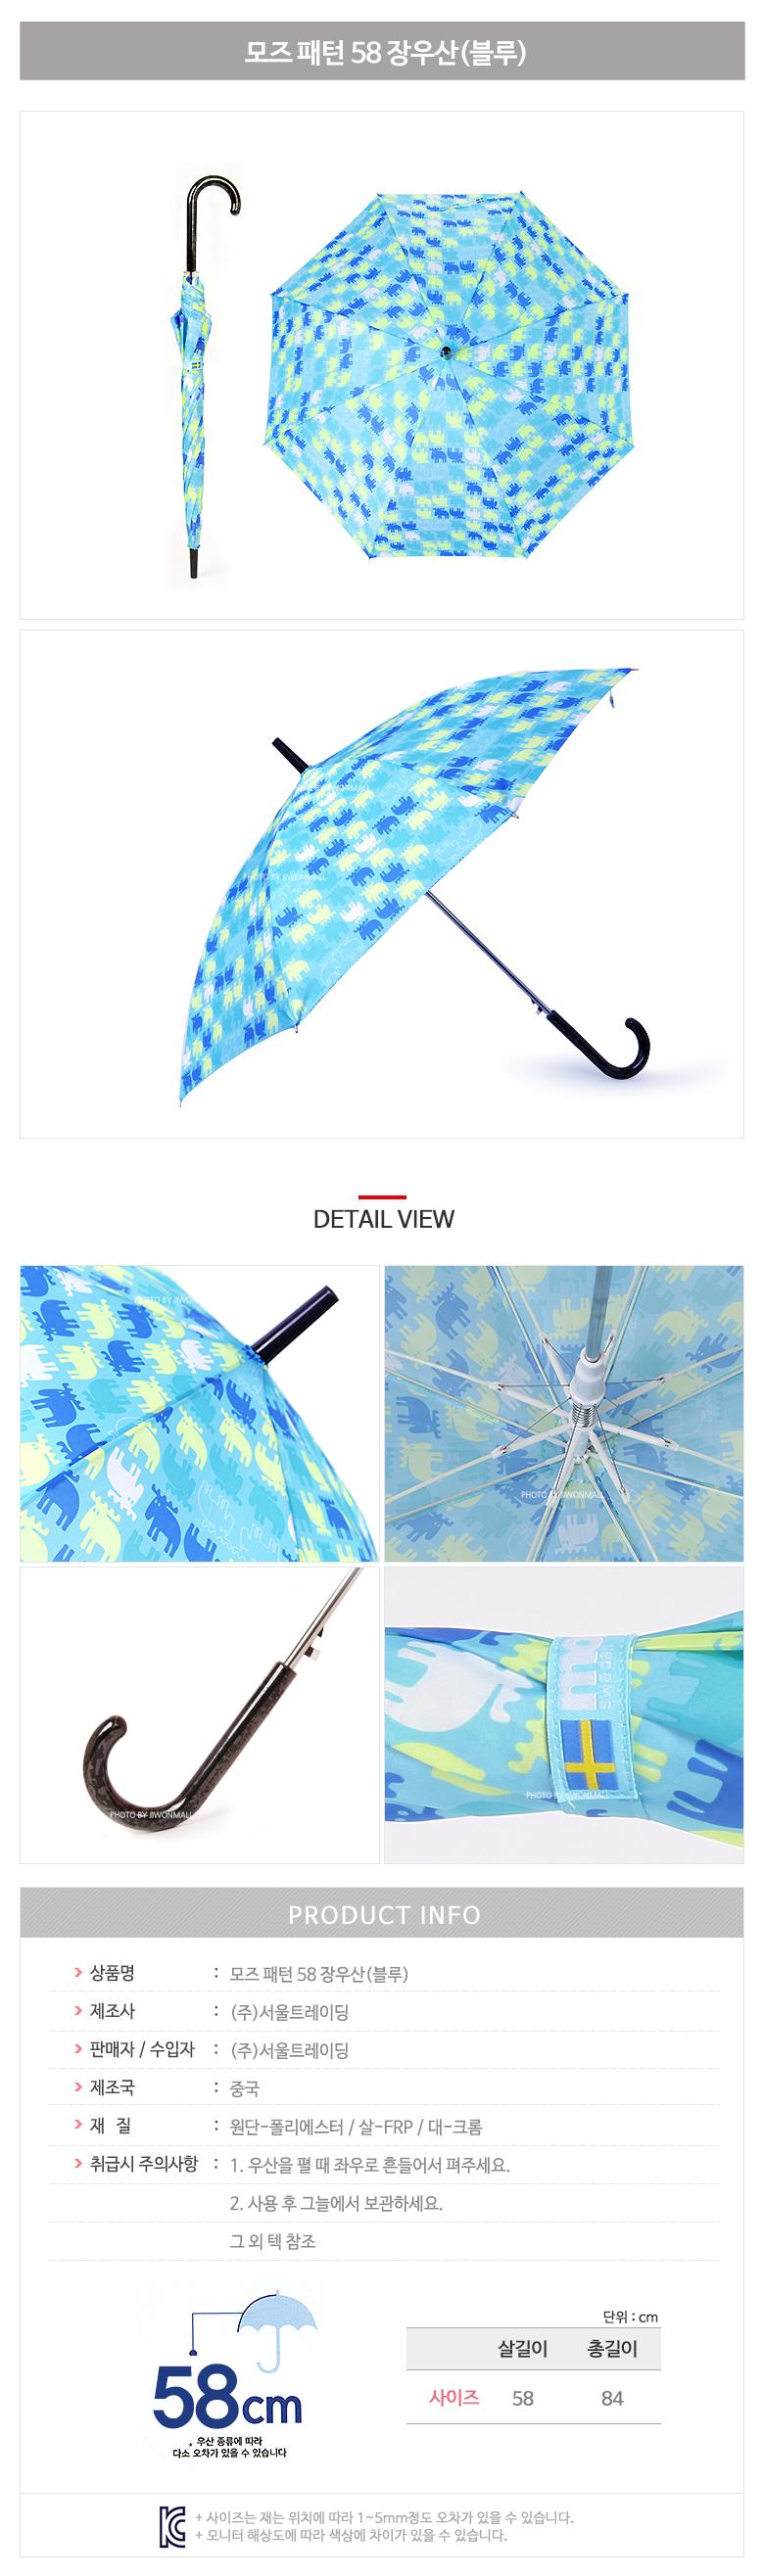 DS-369모즈 패턴 58 우산 초등학생 어린이 남아 장우산 - 리빙톡톡, 18,800원, 우산, 자동장우산